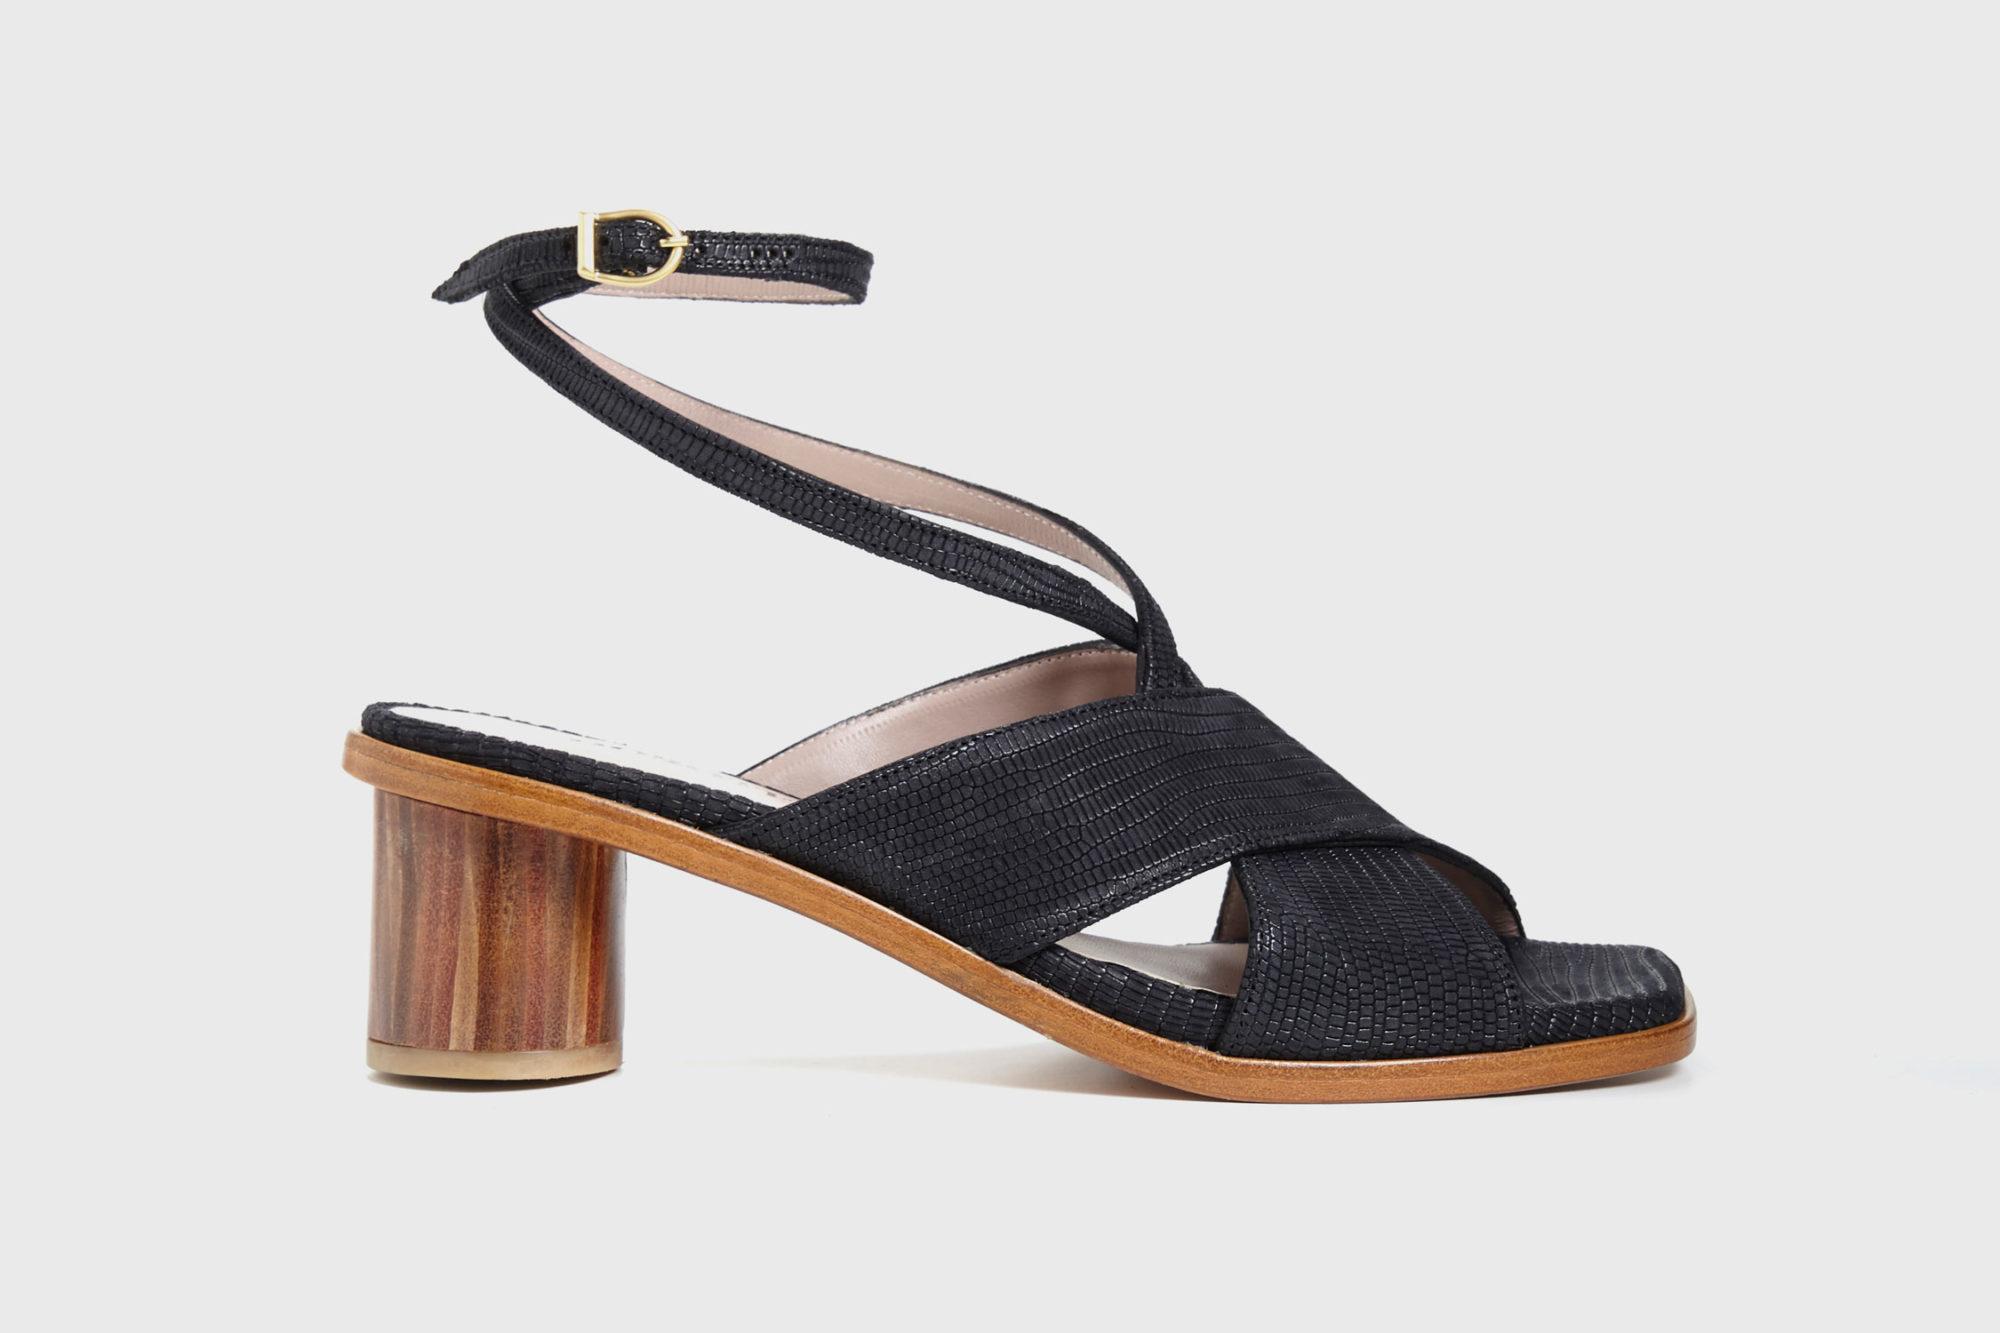 Dorotea sandalia de tacón medio Daphne negra ss17 perfil